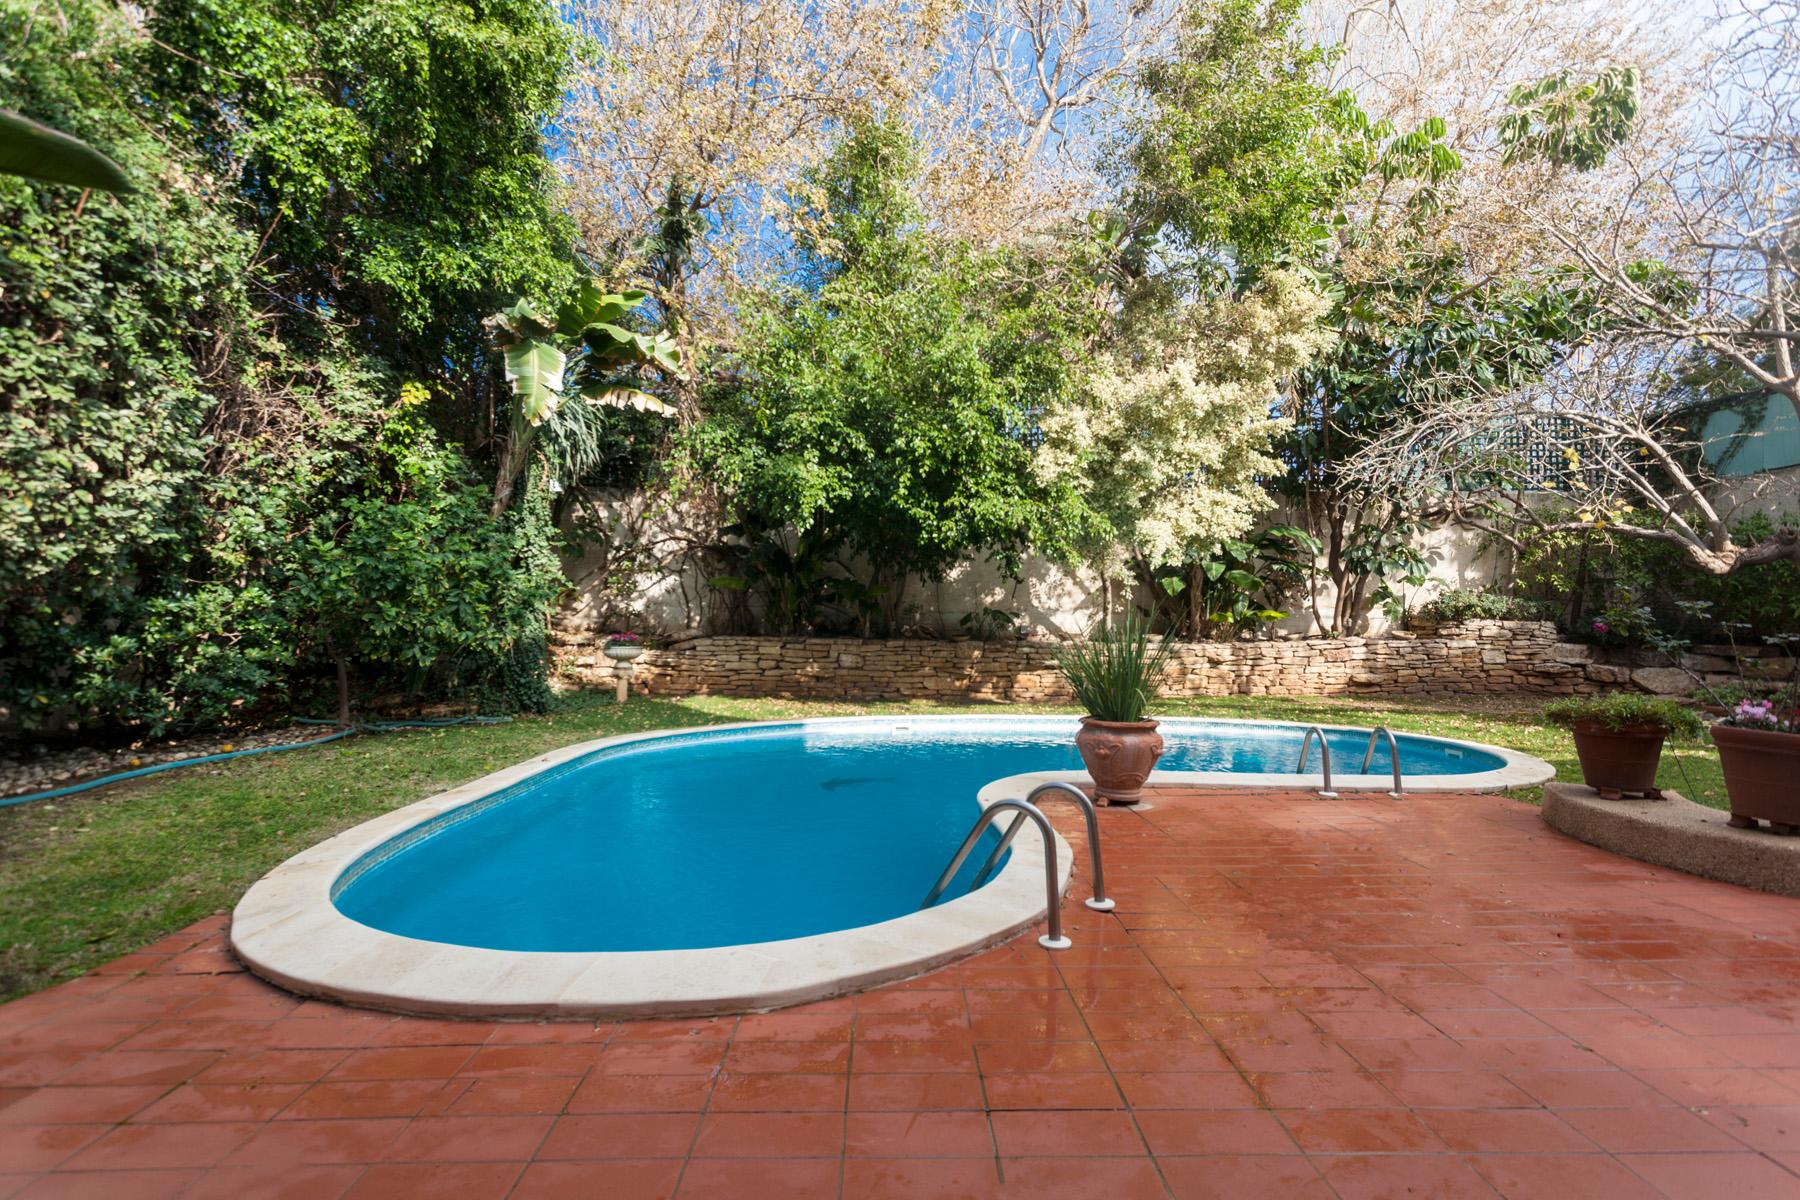 Maison unifamiliale pour l Vente à Inviting Classical Villa near the Sea Herzliya, Israel Israël